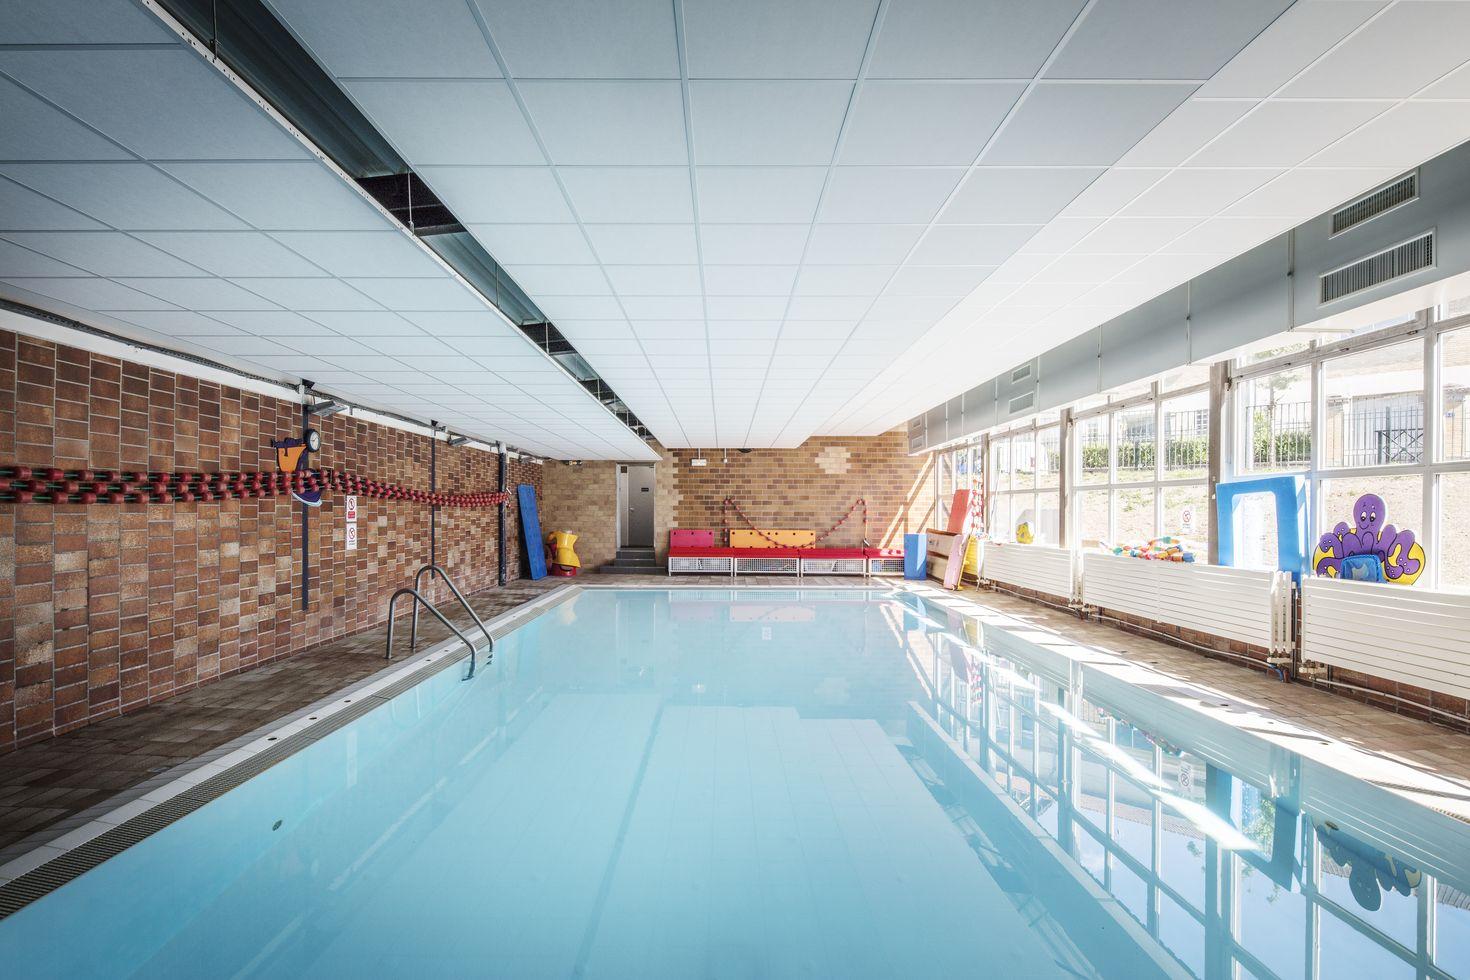 charmant Centre sportif Paul Vaillant-Couturier à Nanterre, 92. Galerie du0027images. u2022  · u2022 · u2022 · u2022 · u2022 · u2022 · u2022 · u2022 · u2022 · u2022 ...